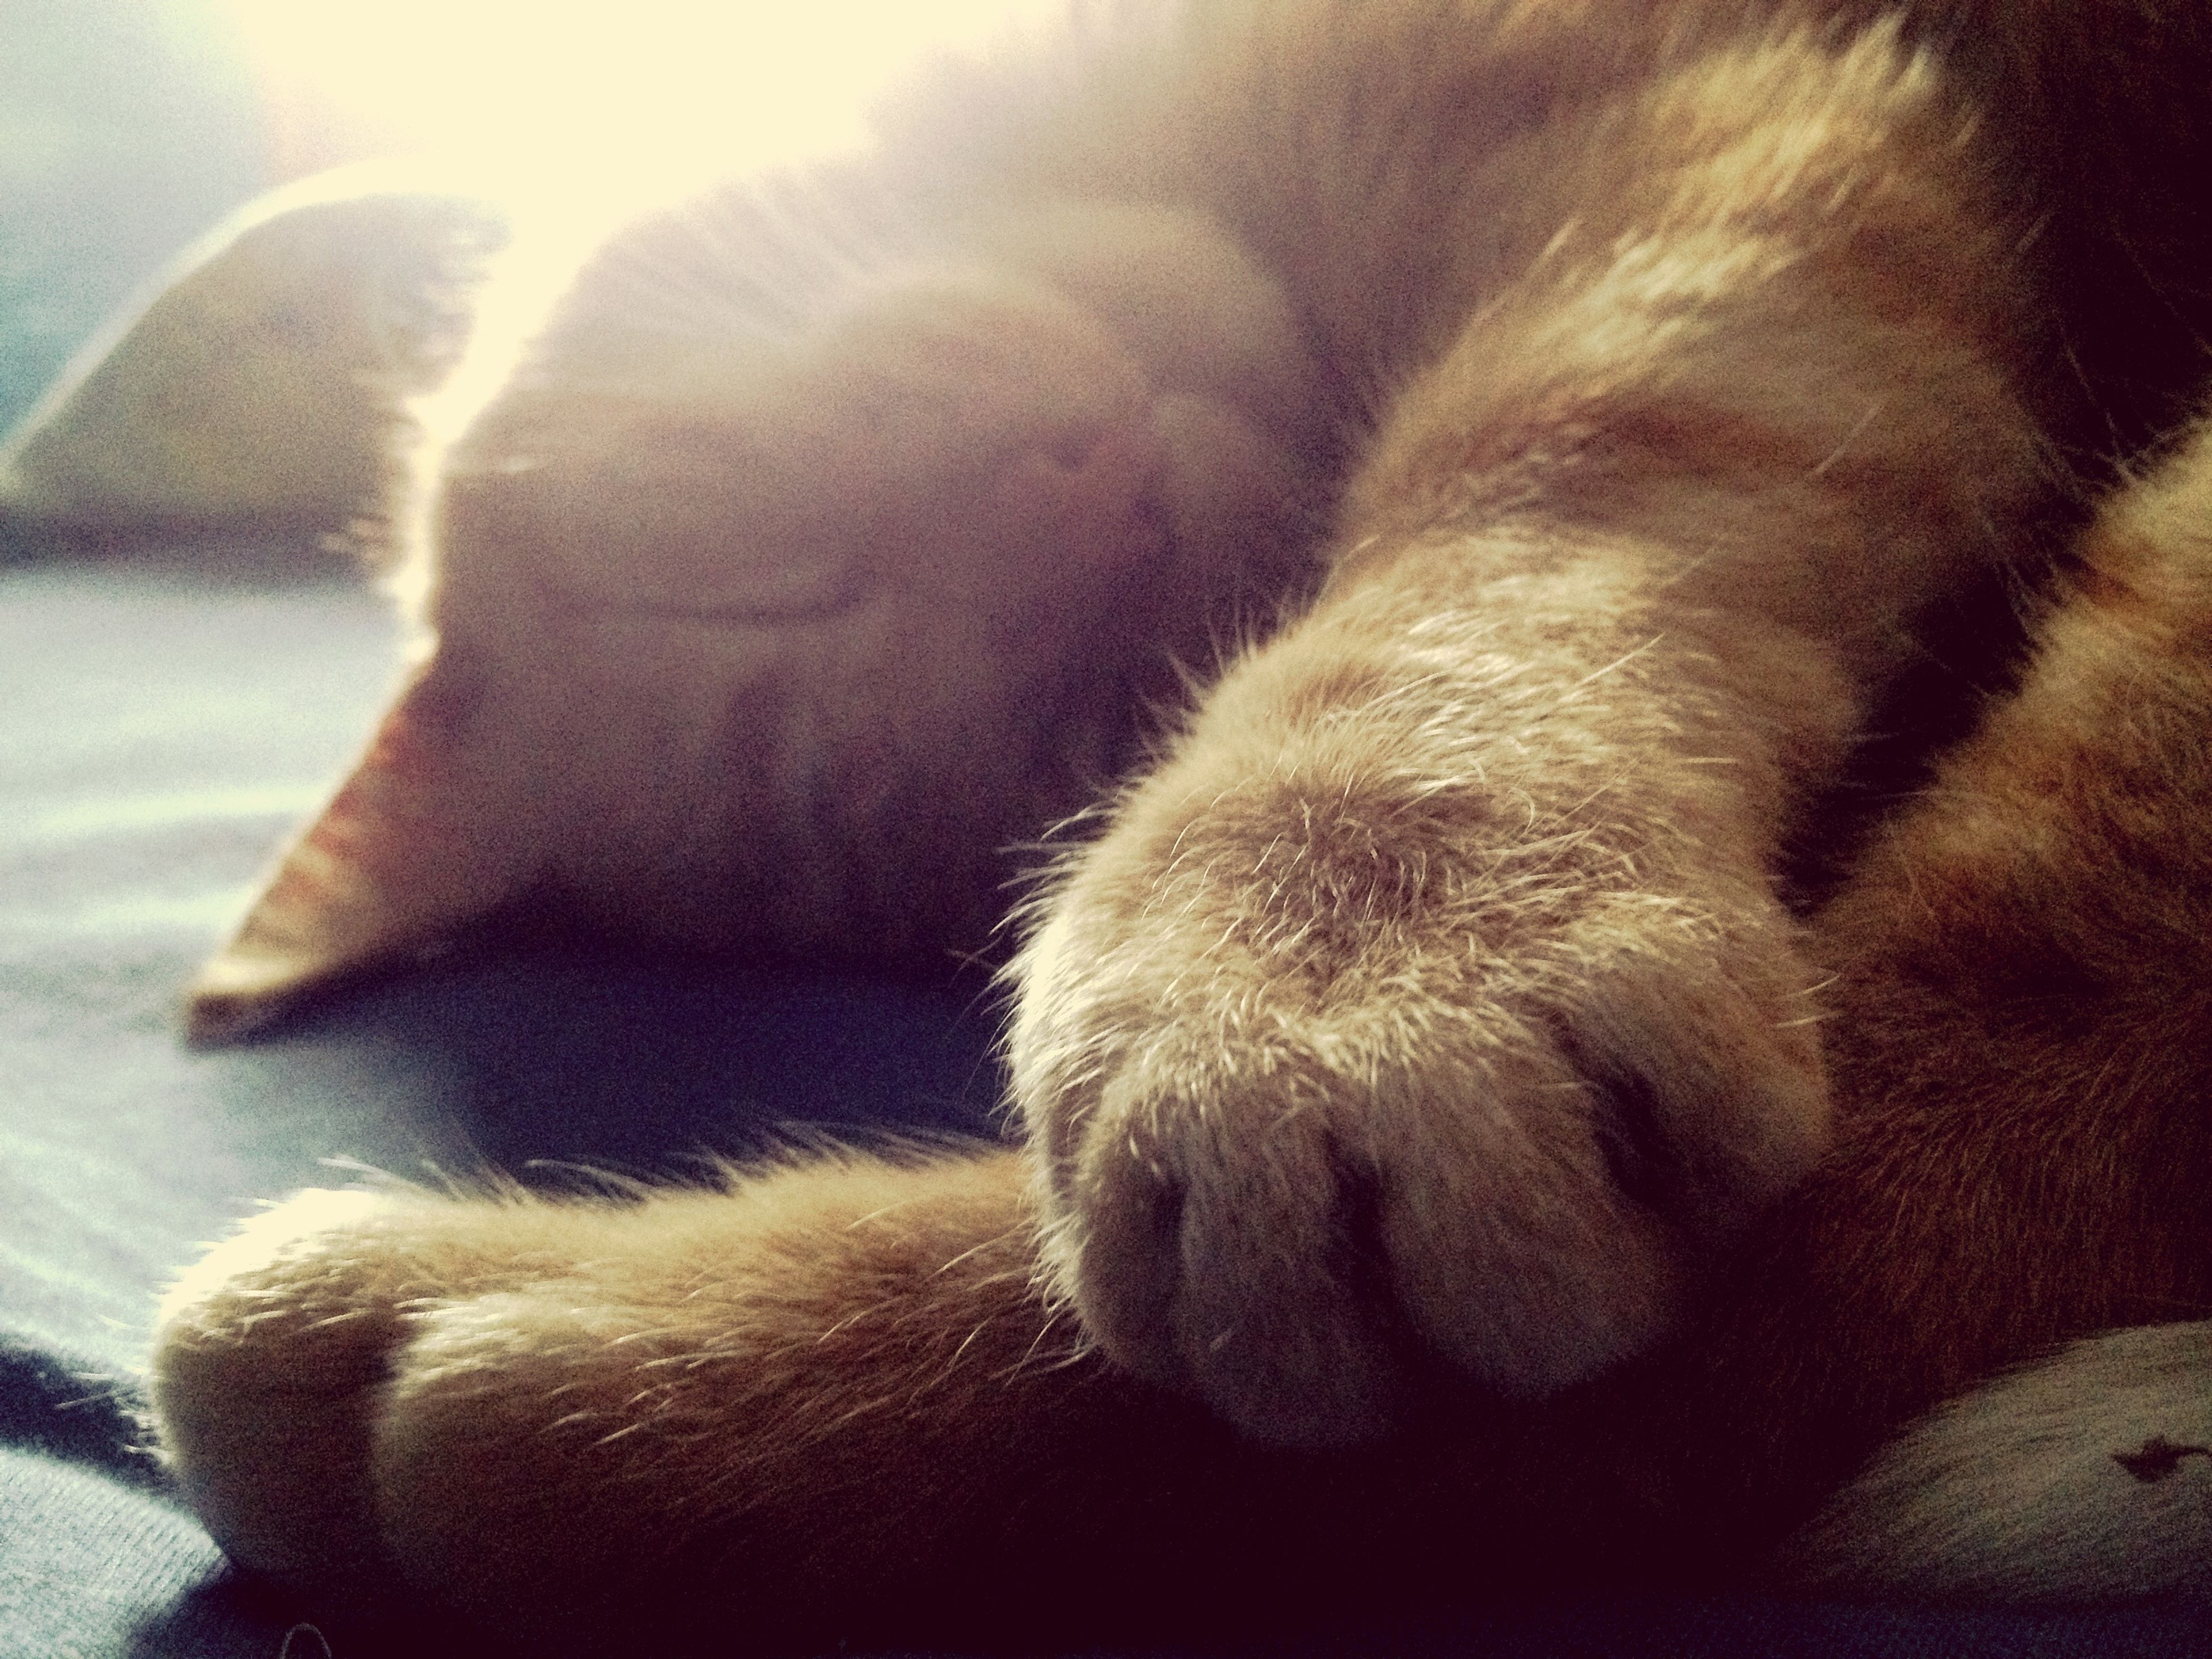 My too cute cat sleeping 😍😘